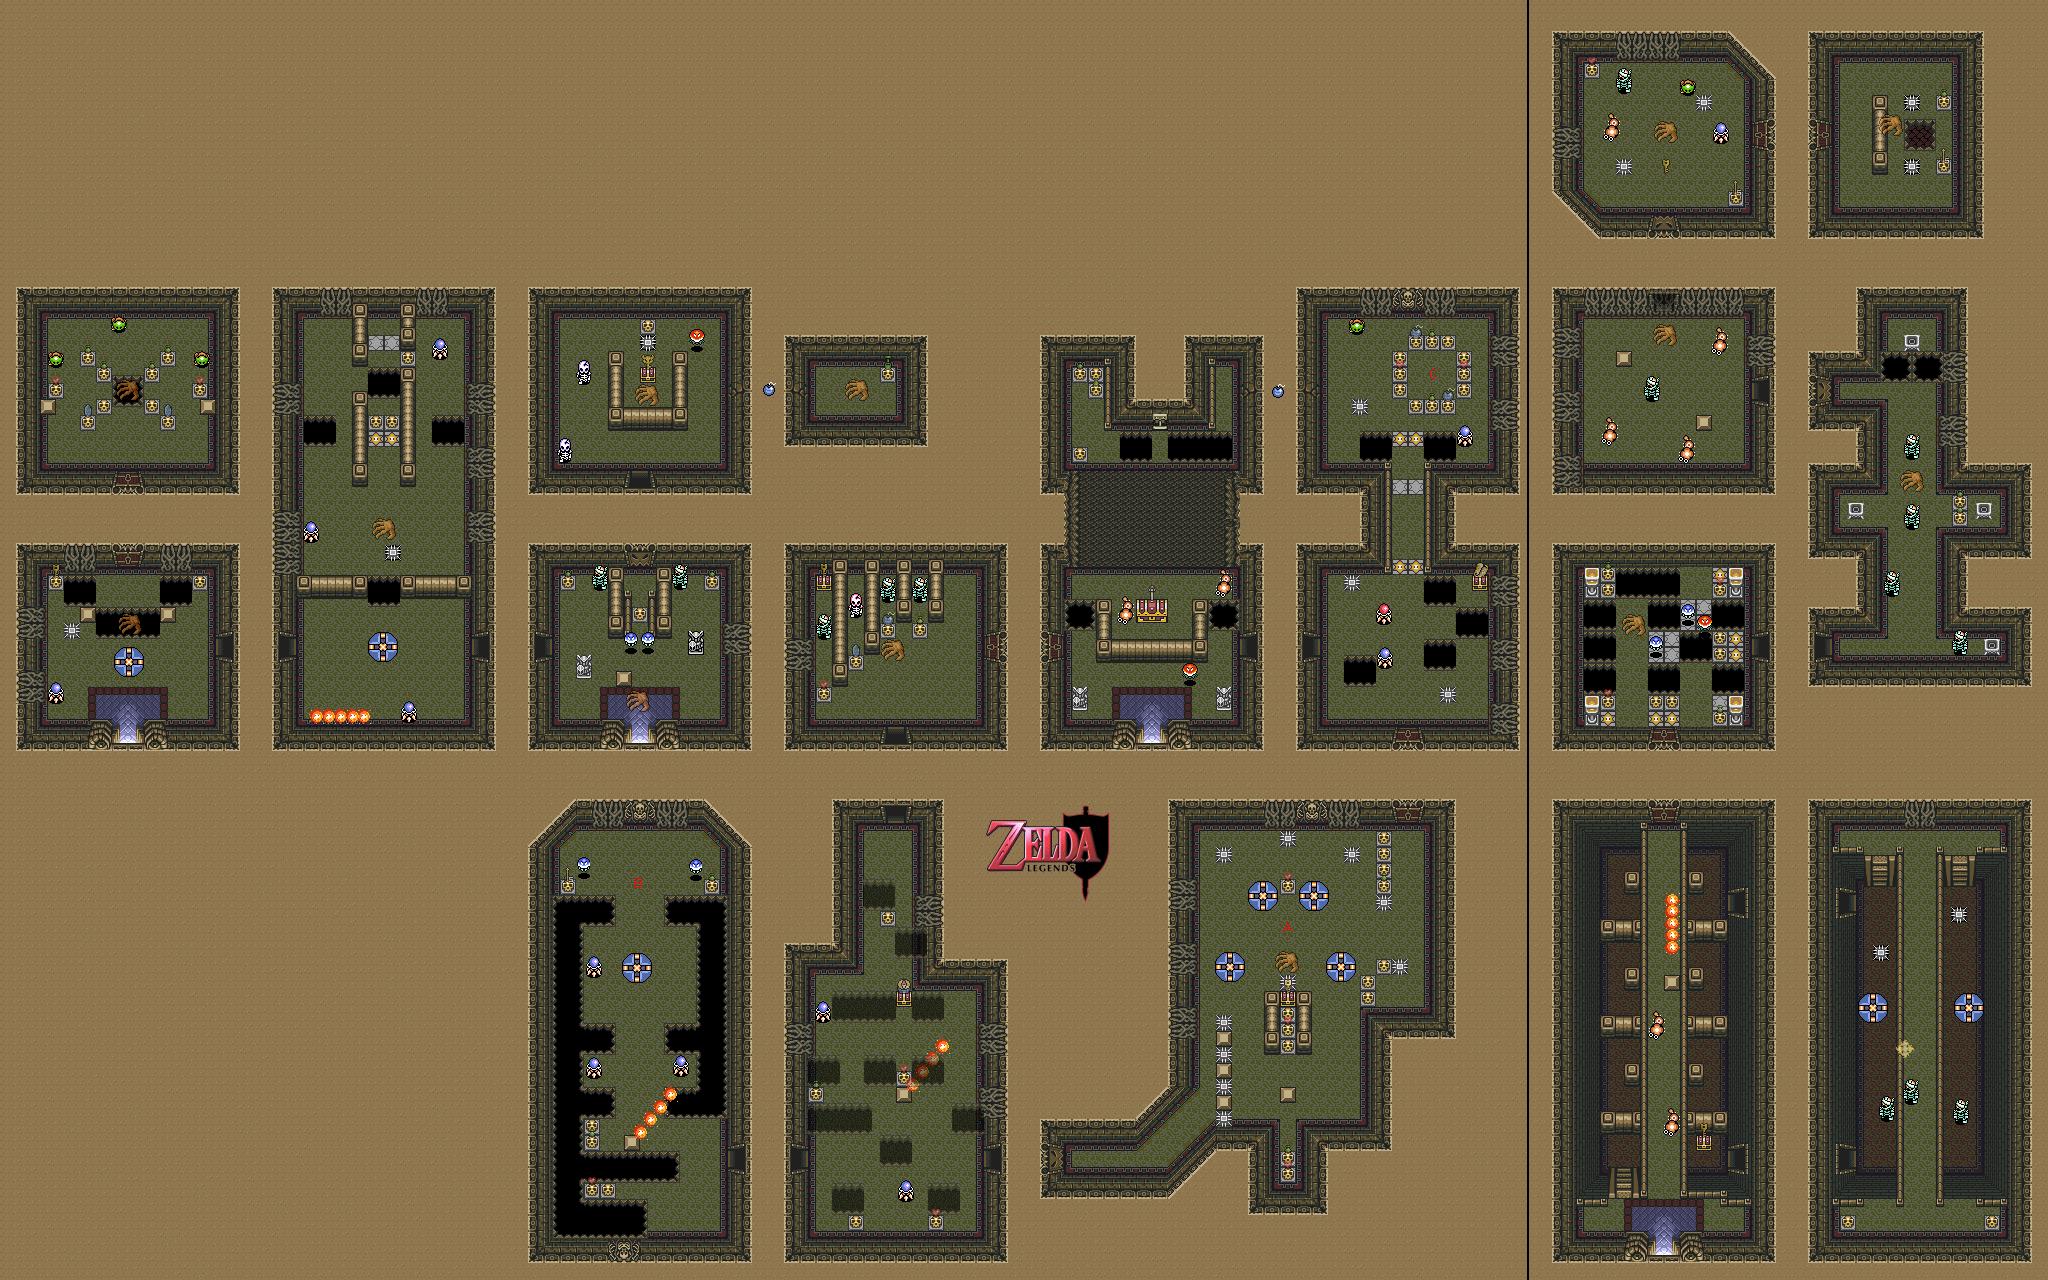 Zelda legends the library visual guides alttp 11 for Floor 4 mini boss map swordburst 2